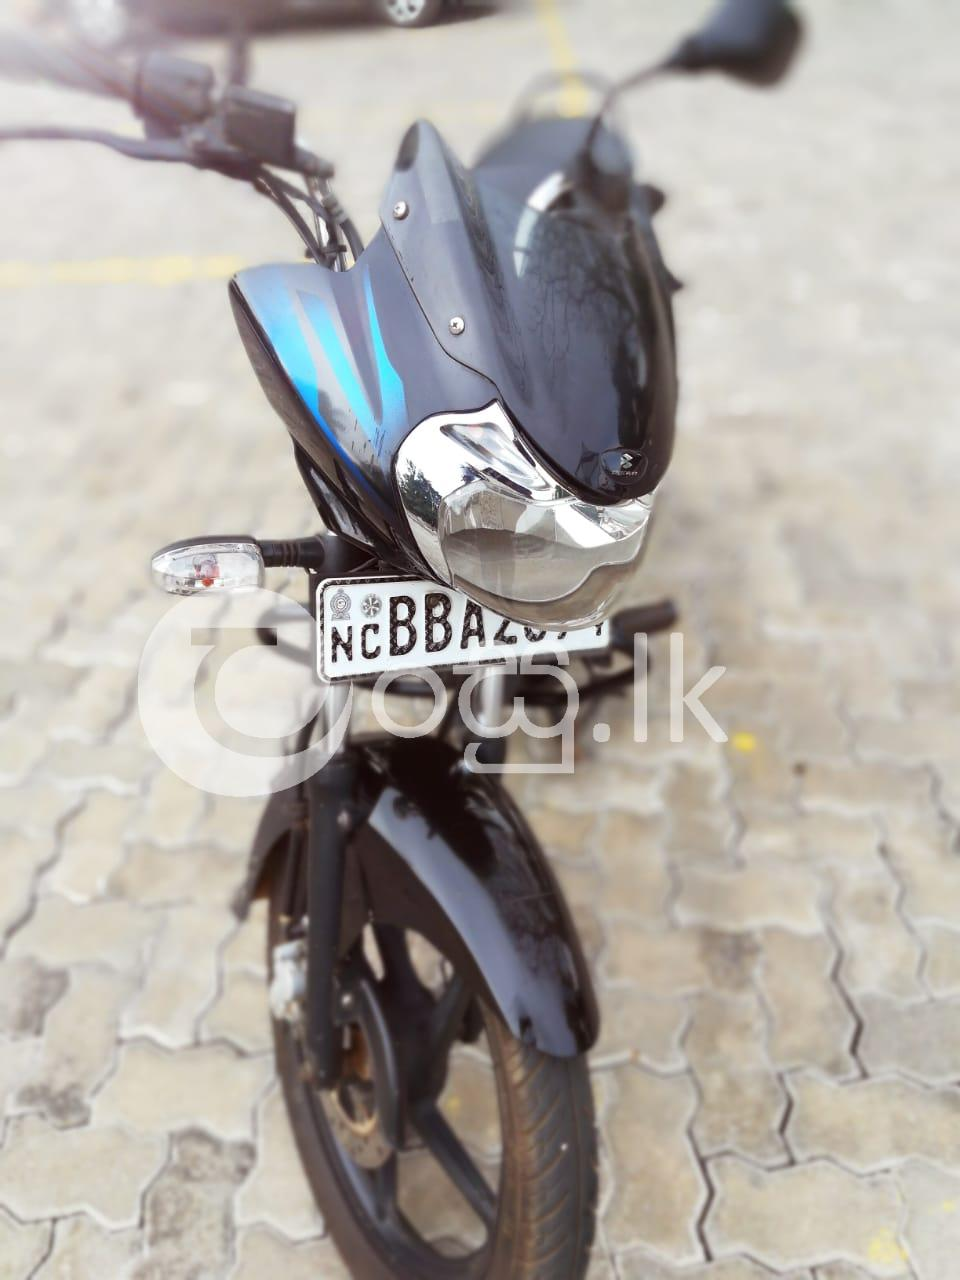 Bajaj Discover 125 Motorbikes & Scooters in Anuradhapura